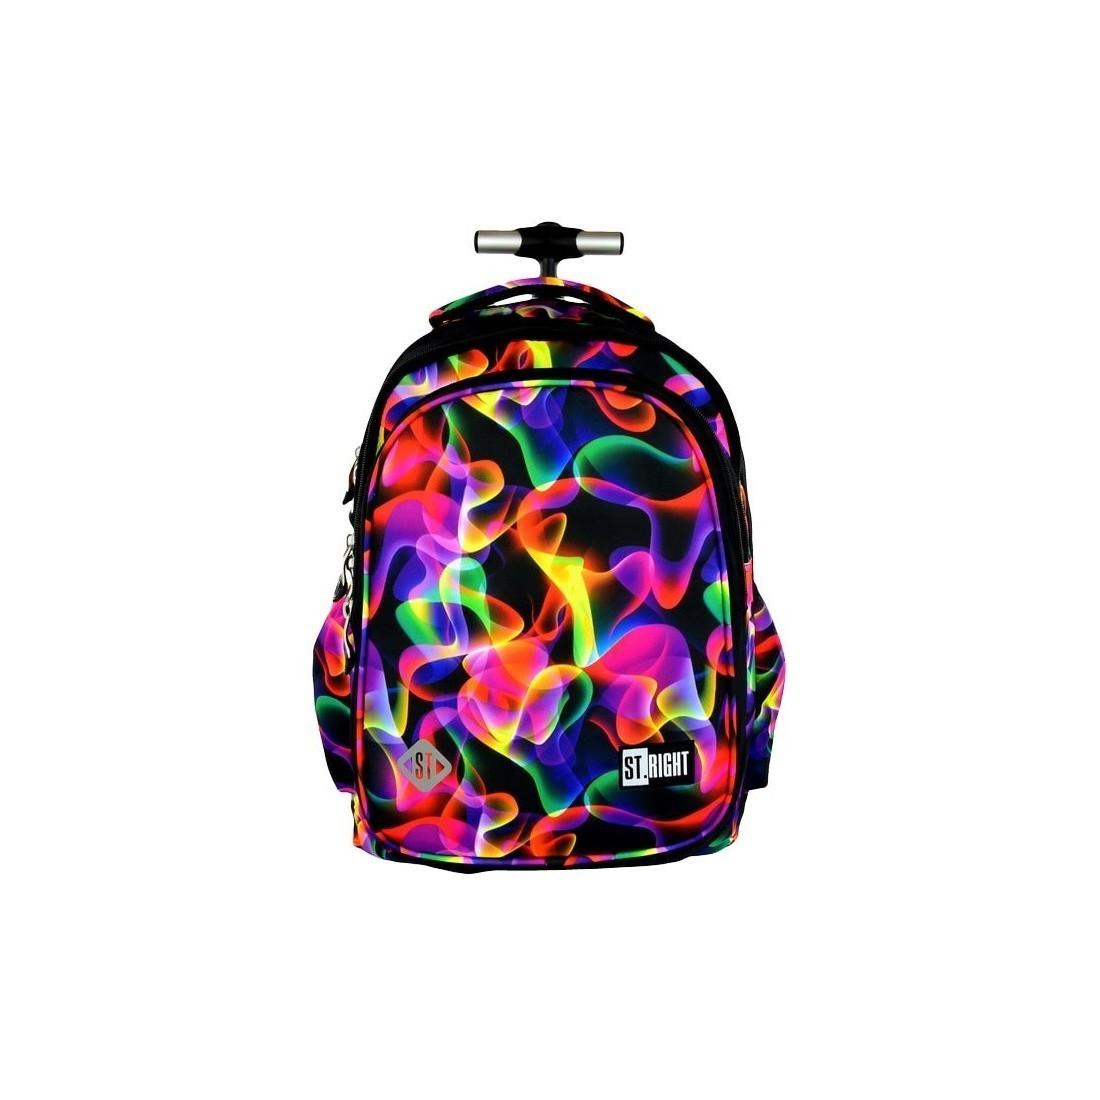 Plecak na kółkach ST.RIGHT ILLUSION kolorowe fale